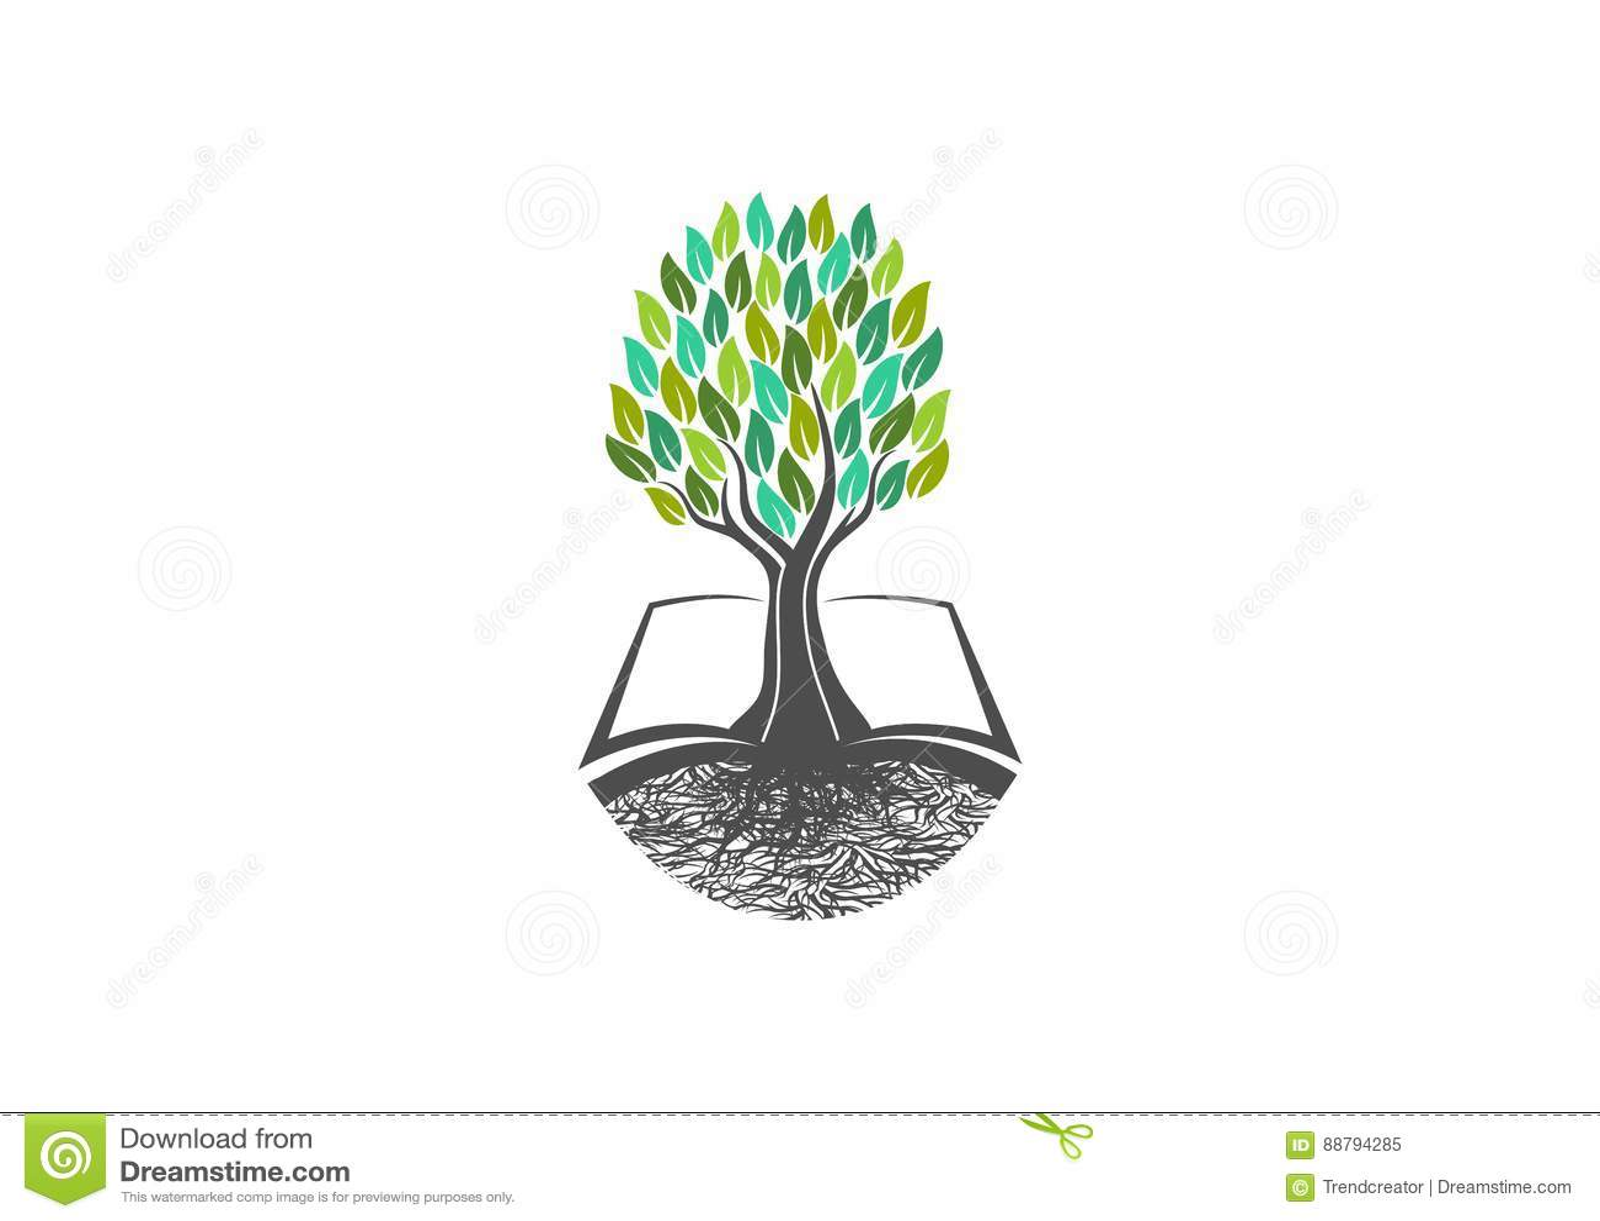 Значок дерева на схему